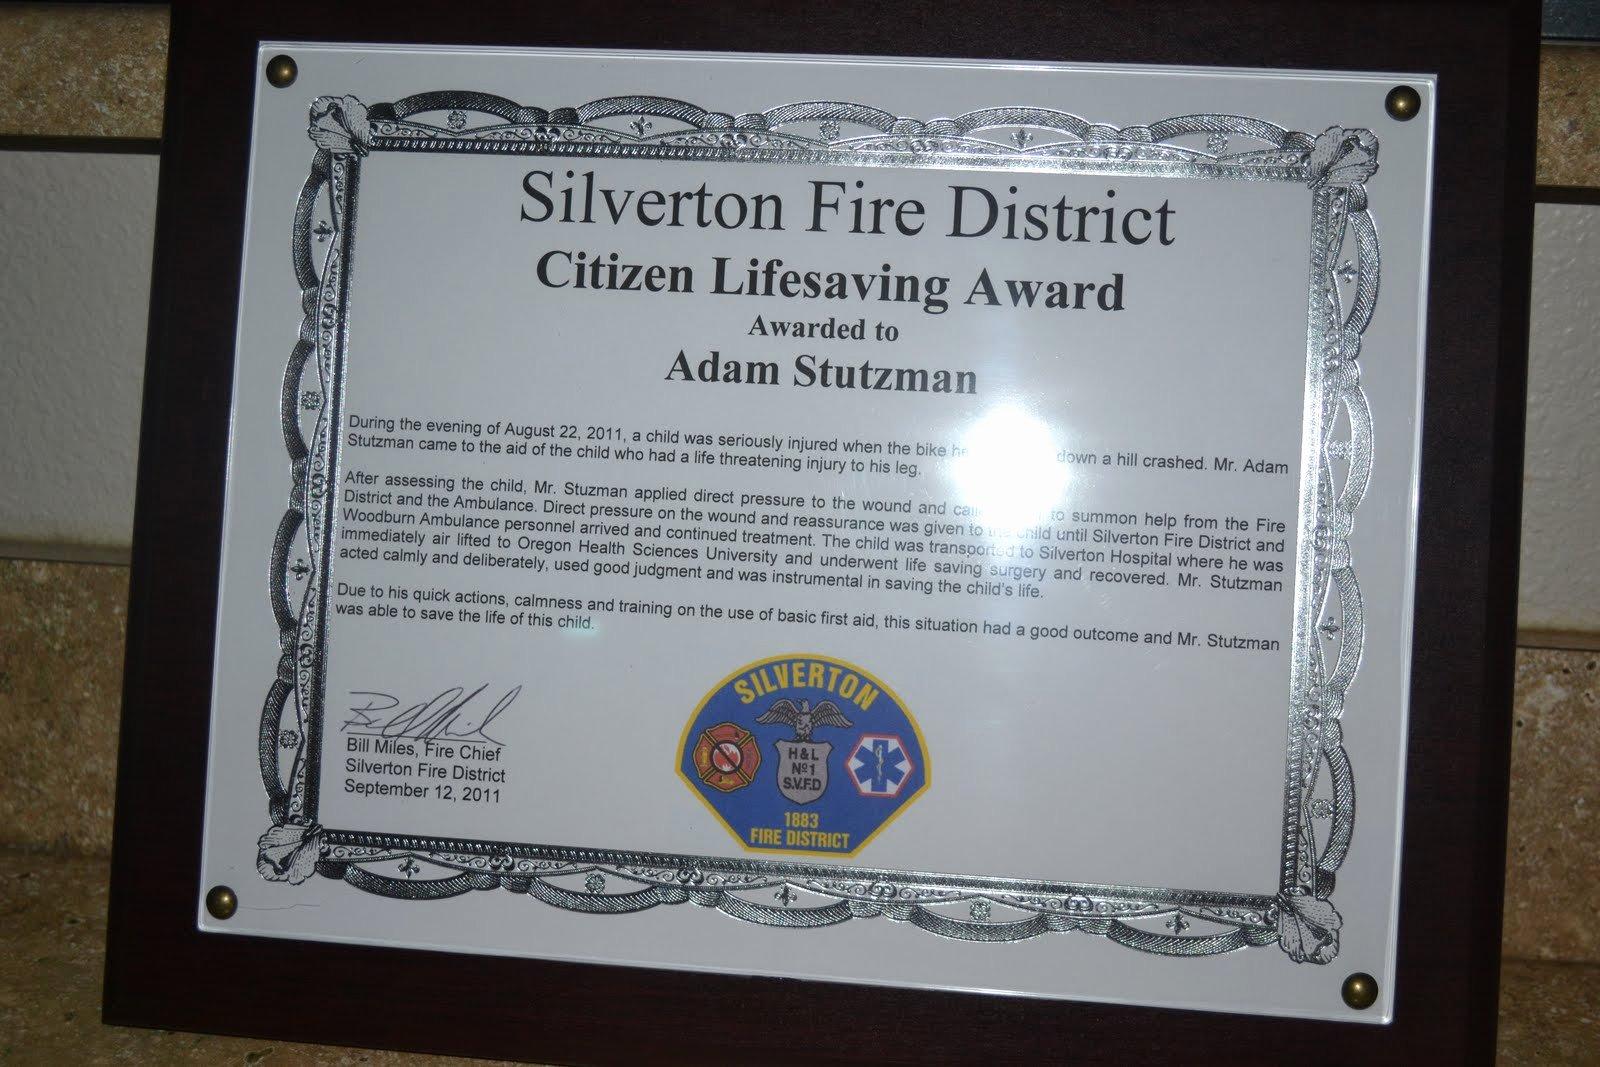 Life Saving Award Certificate Luxury the Stutzman Family Treasures Through His Grace Adam